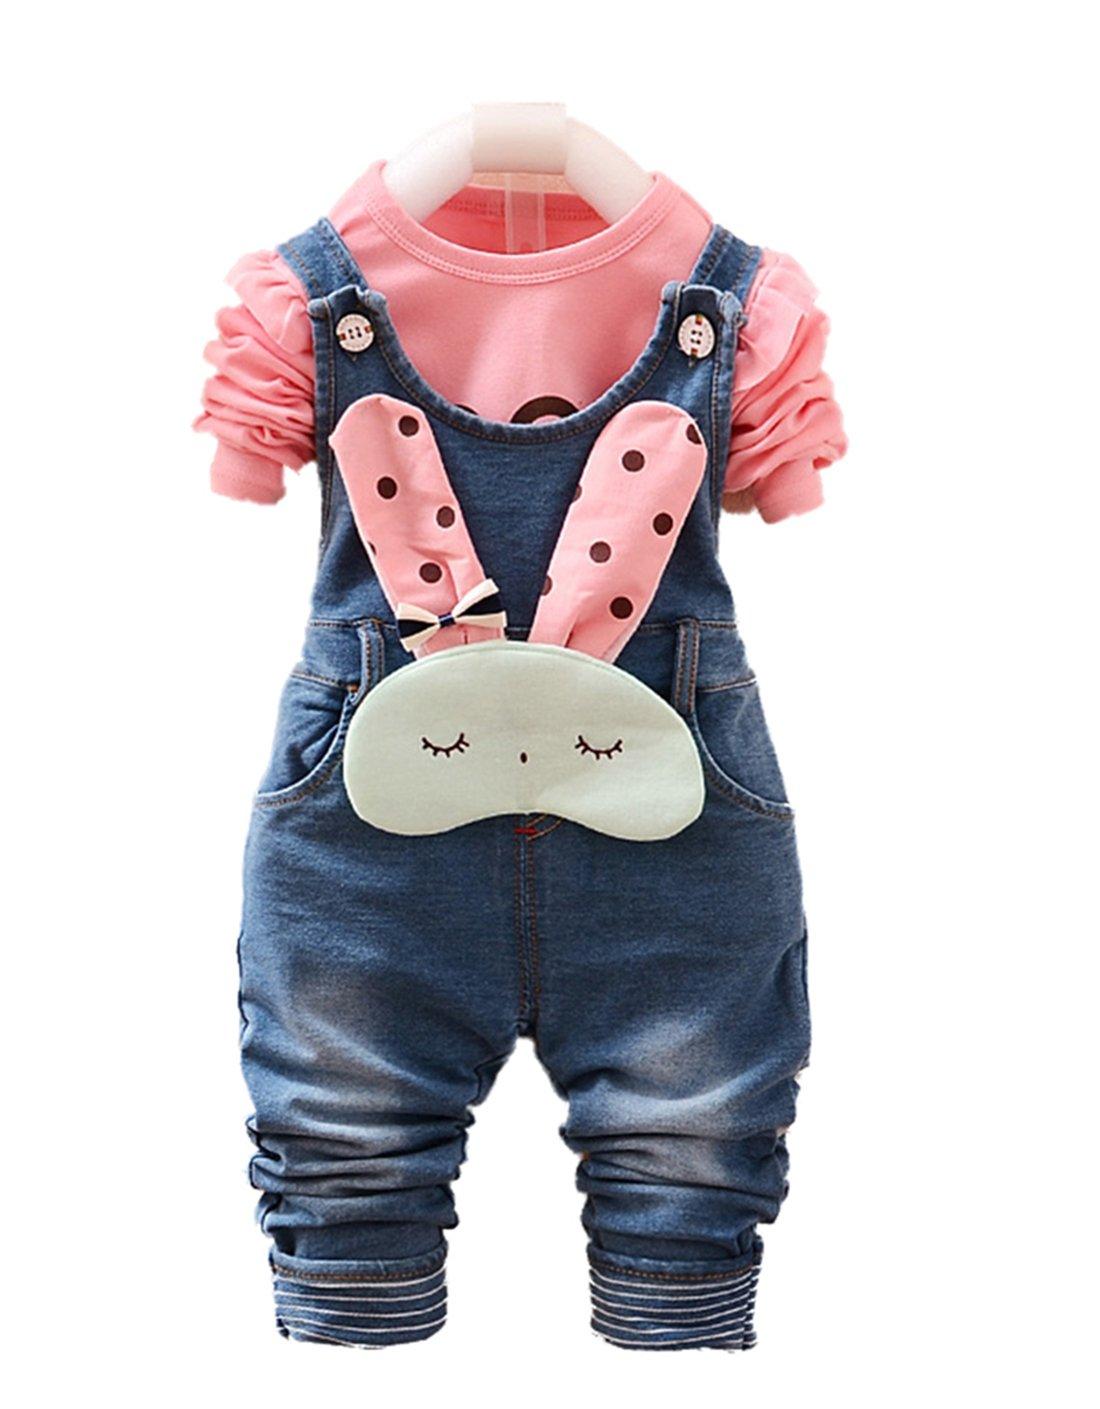 Chumhey Baby & Little Girls Blue Denim Overalls Pant Sets Bunny Decor